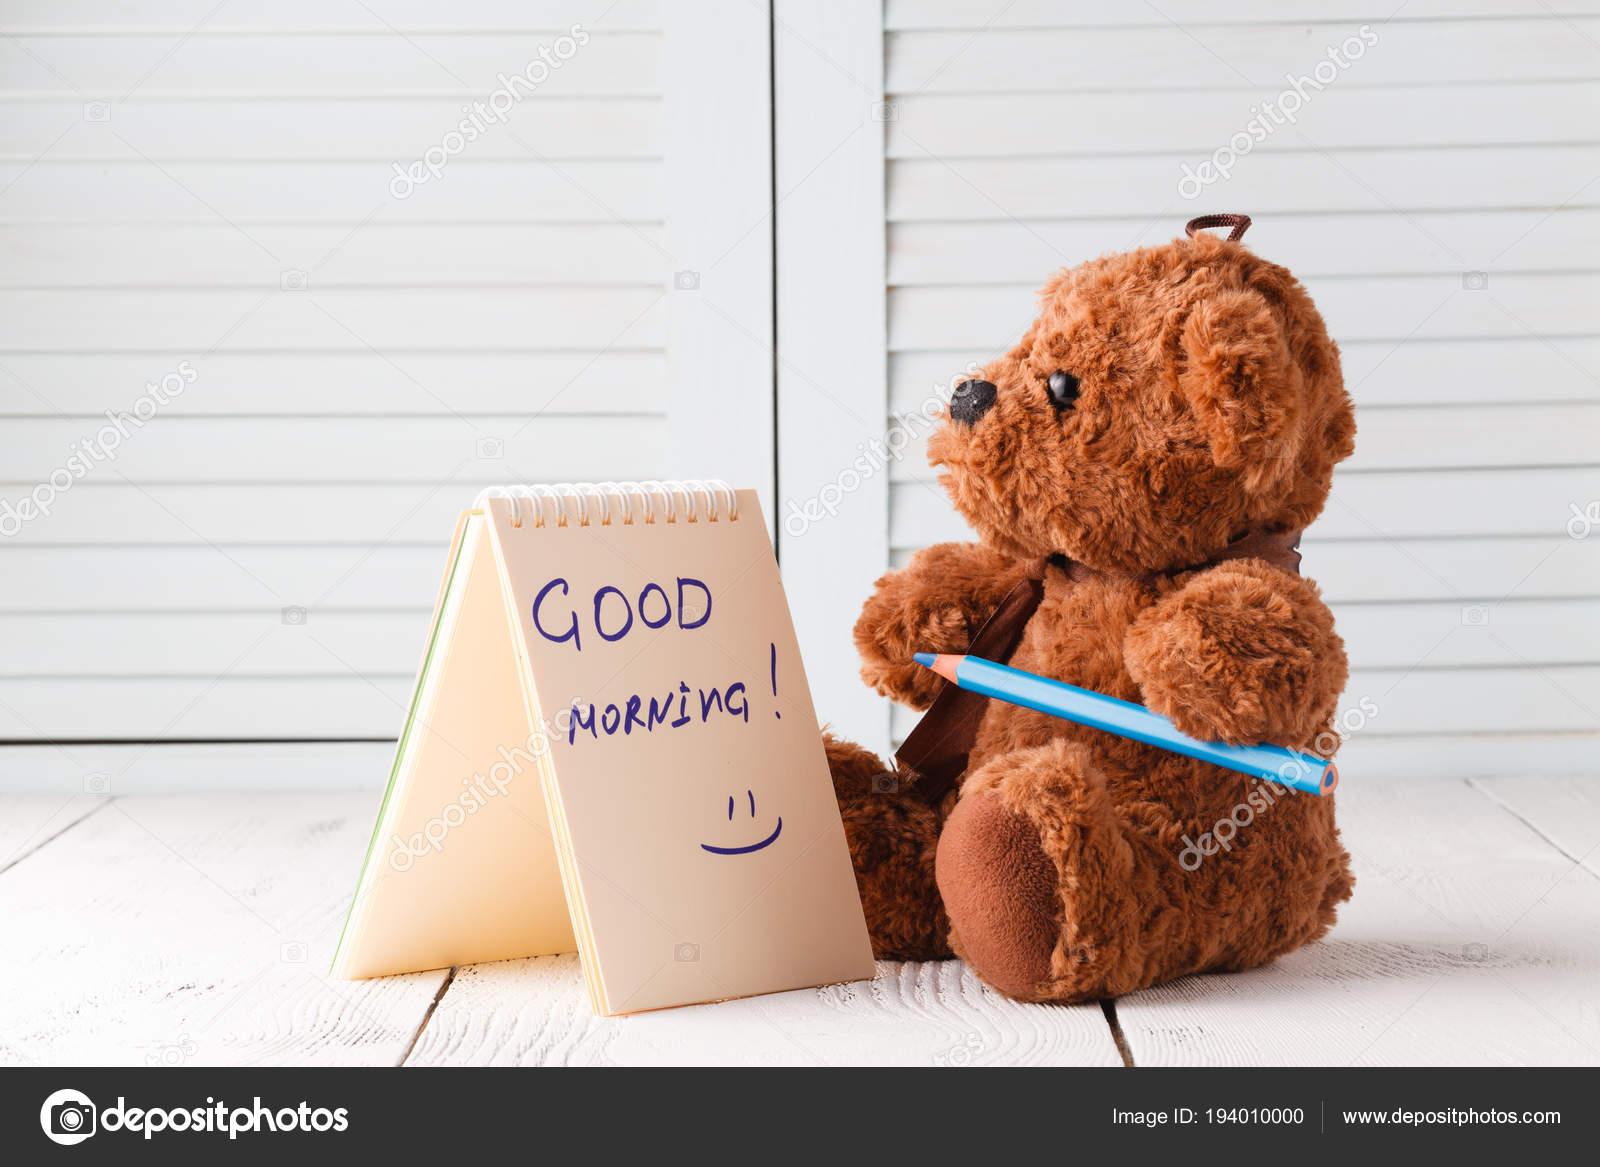 Good Morning With Teddy Bear Stock Photo Andreycherkasov 194010000